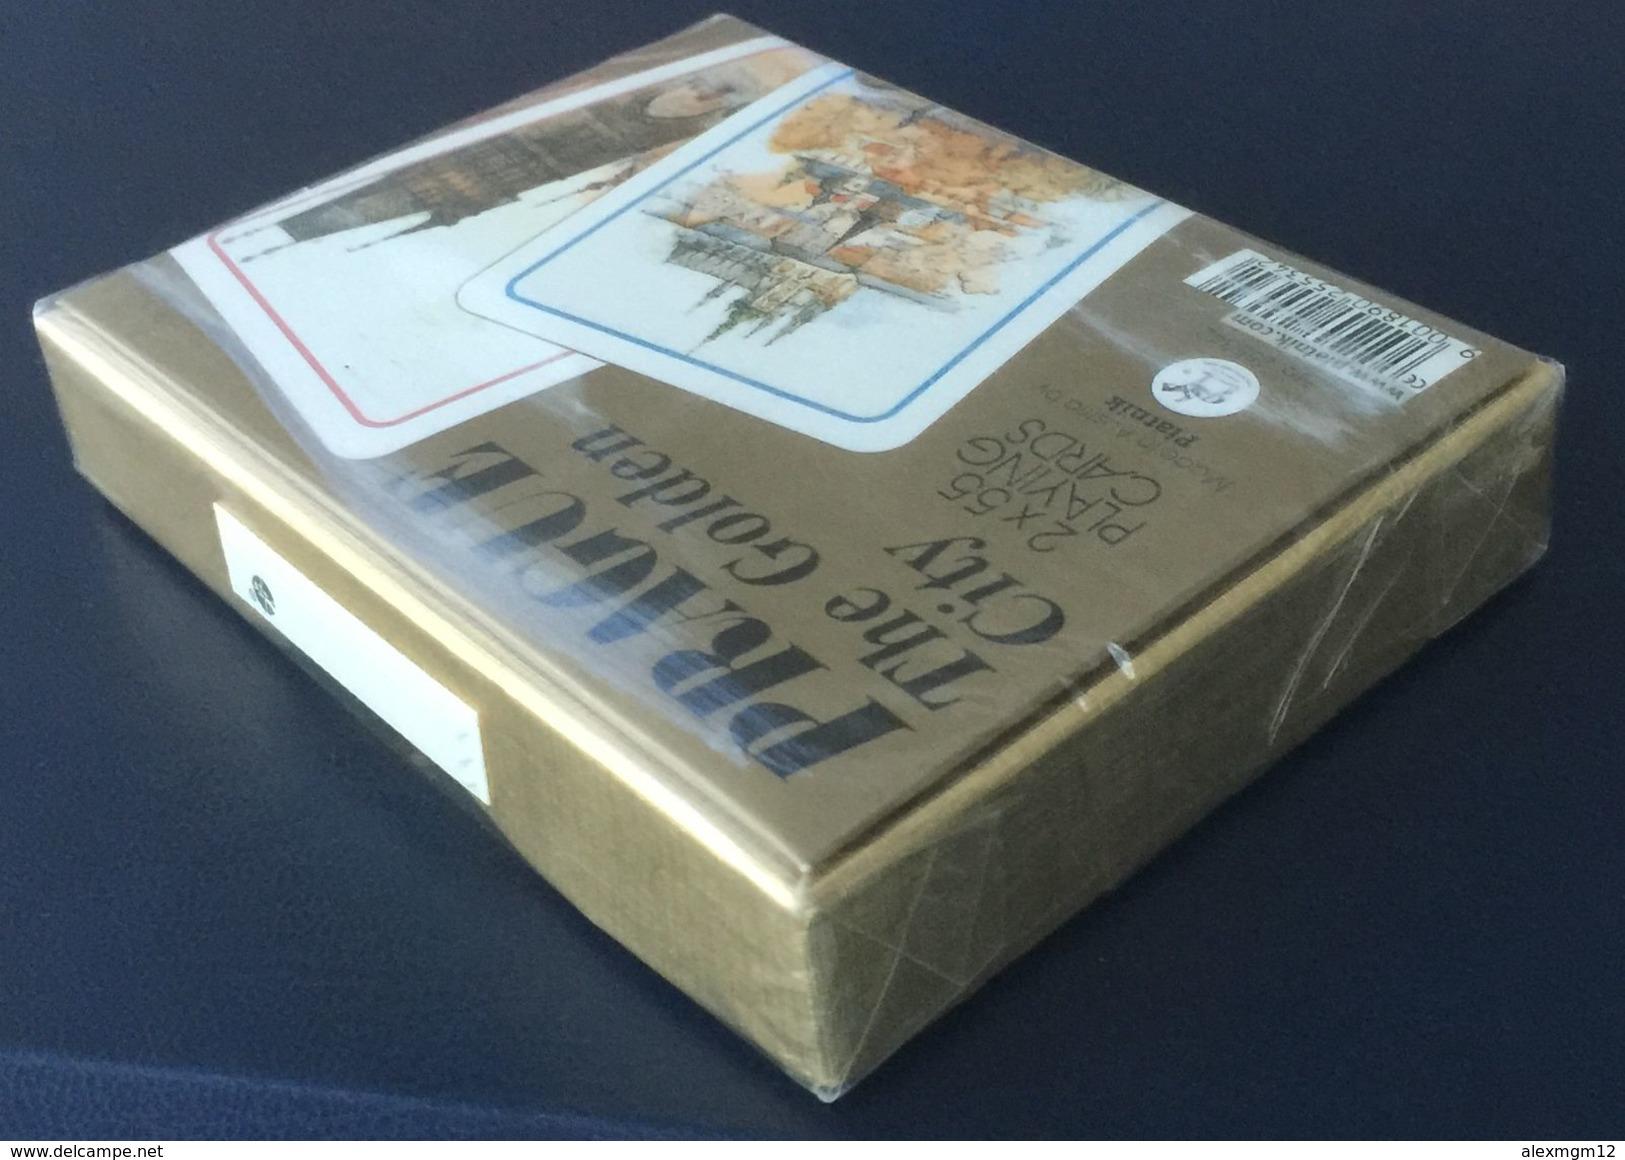 Prague The Golden City Playing Cards, Piatnik, Austria, New, Sealed, 2 Decks - Playing Cards (classic)